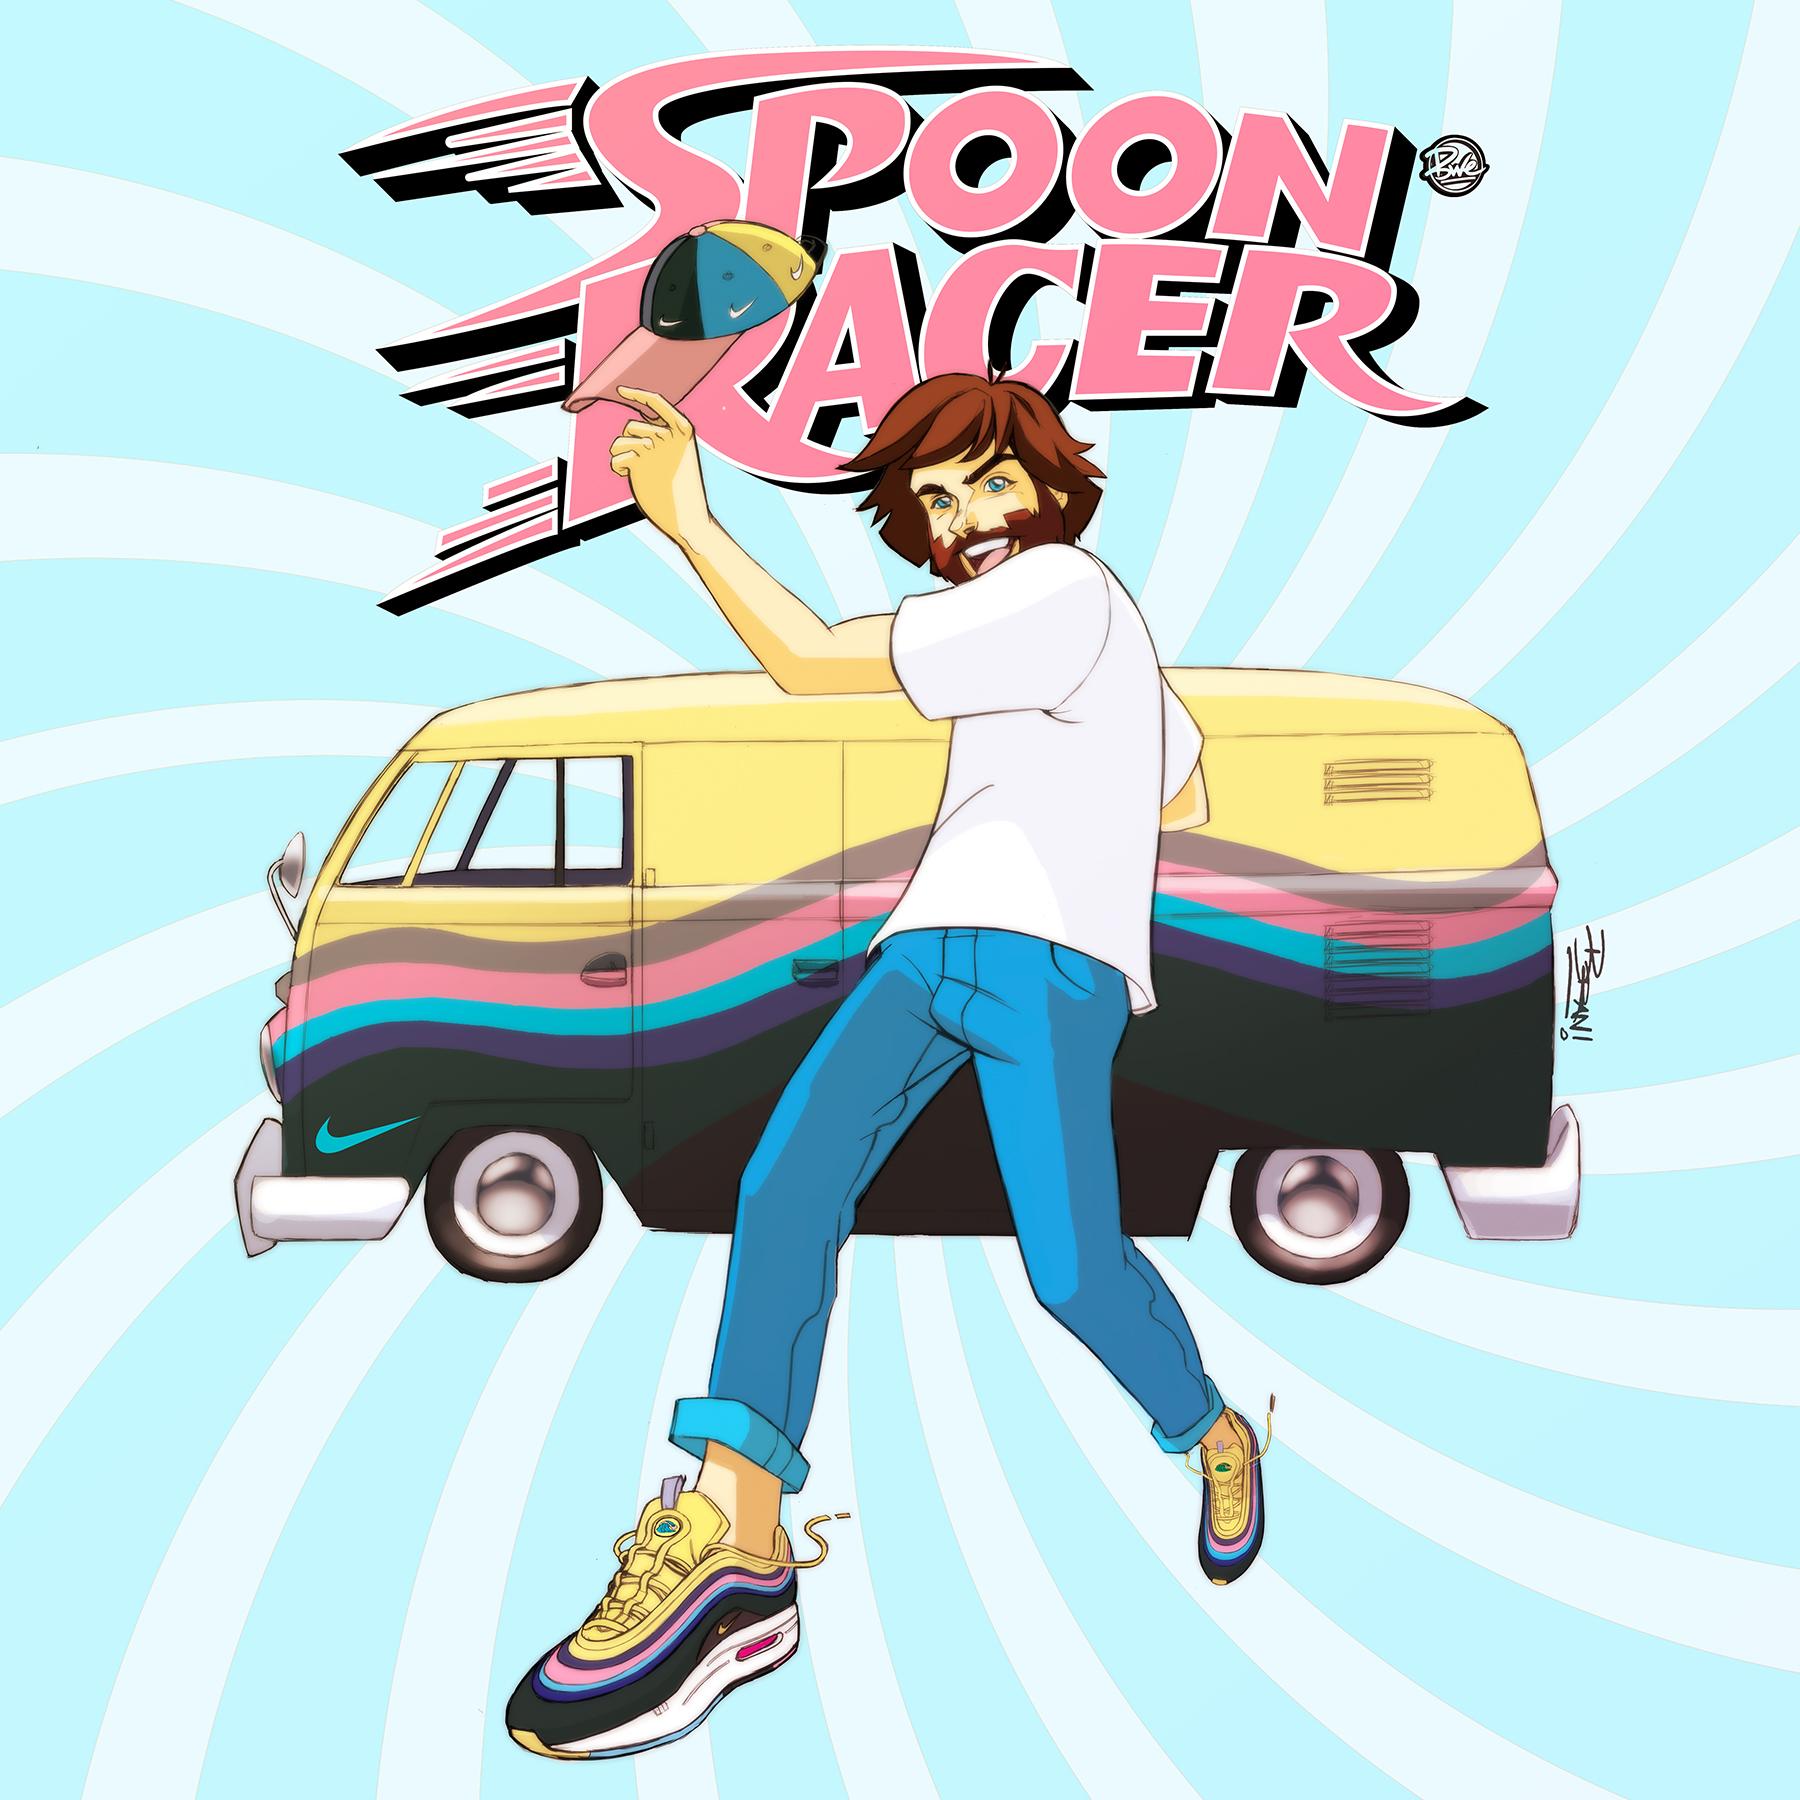 Spoon Racer Parody